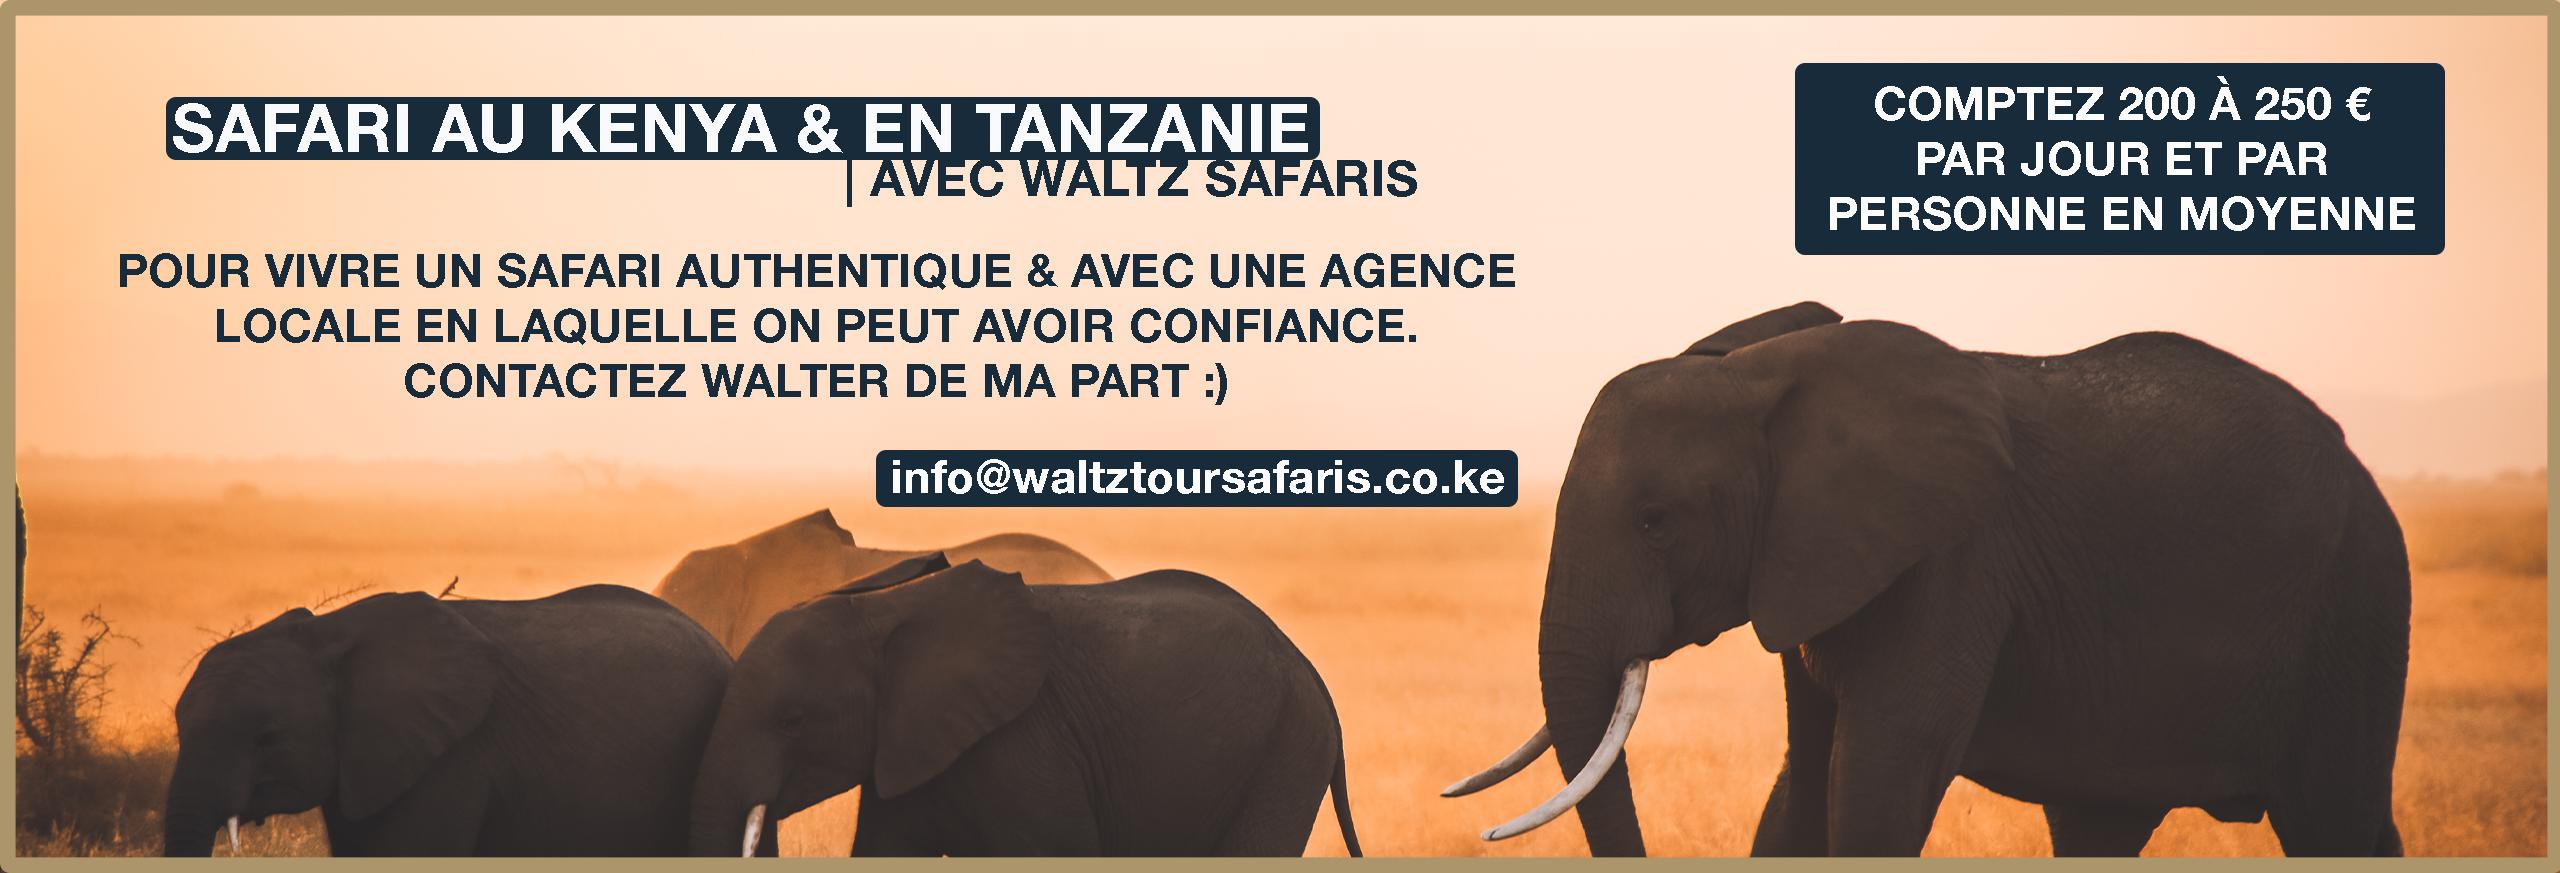 waltz safaris